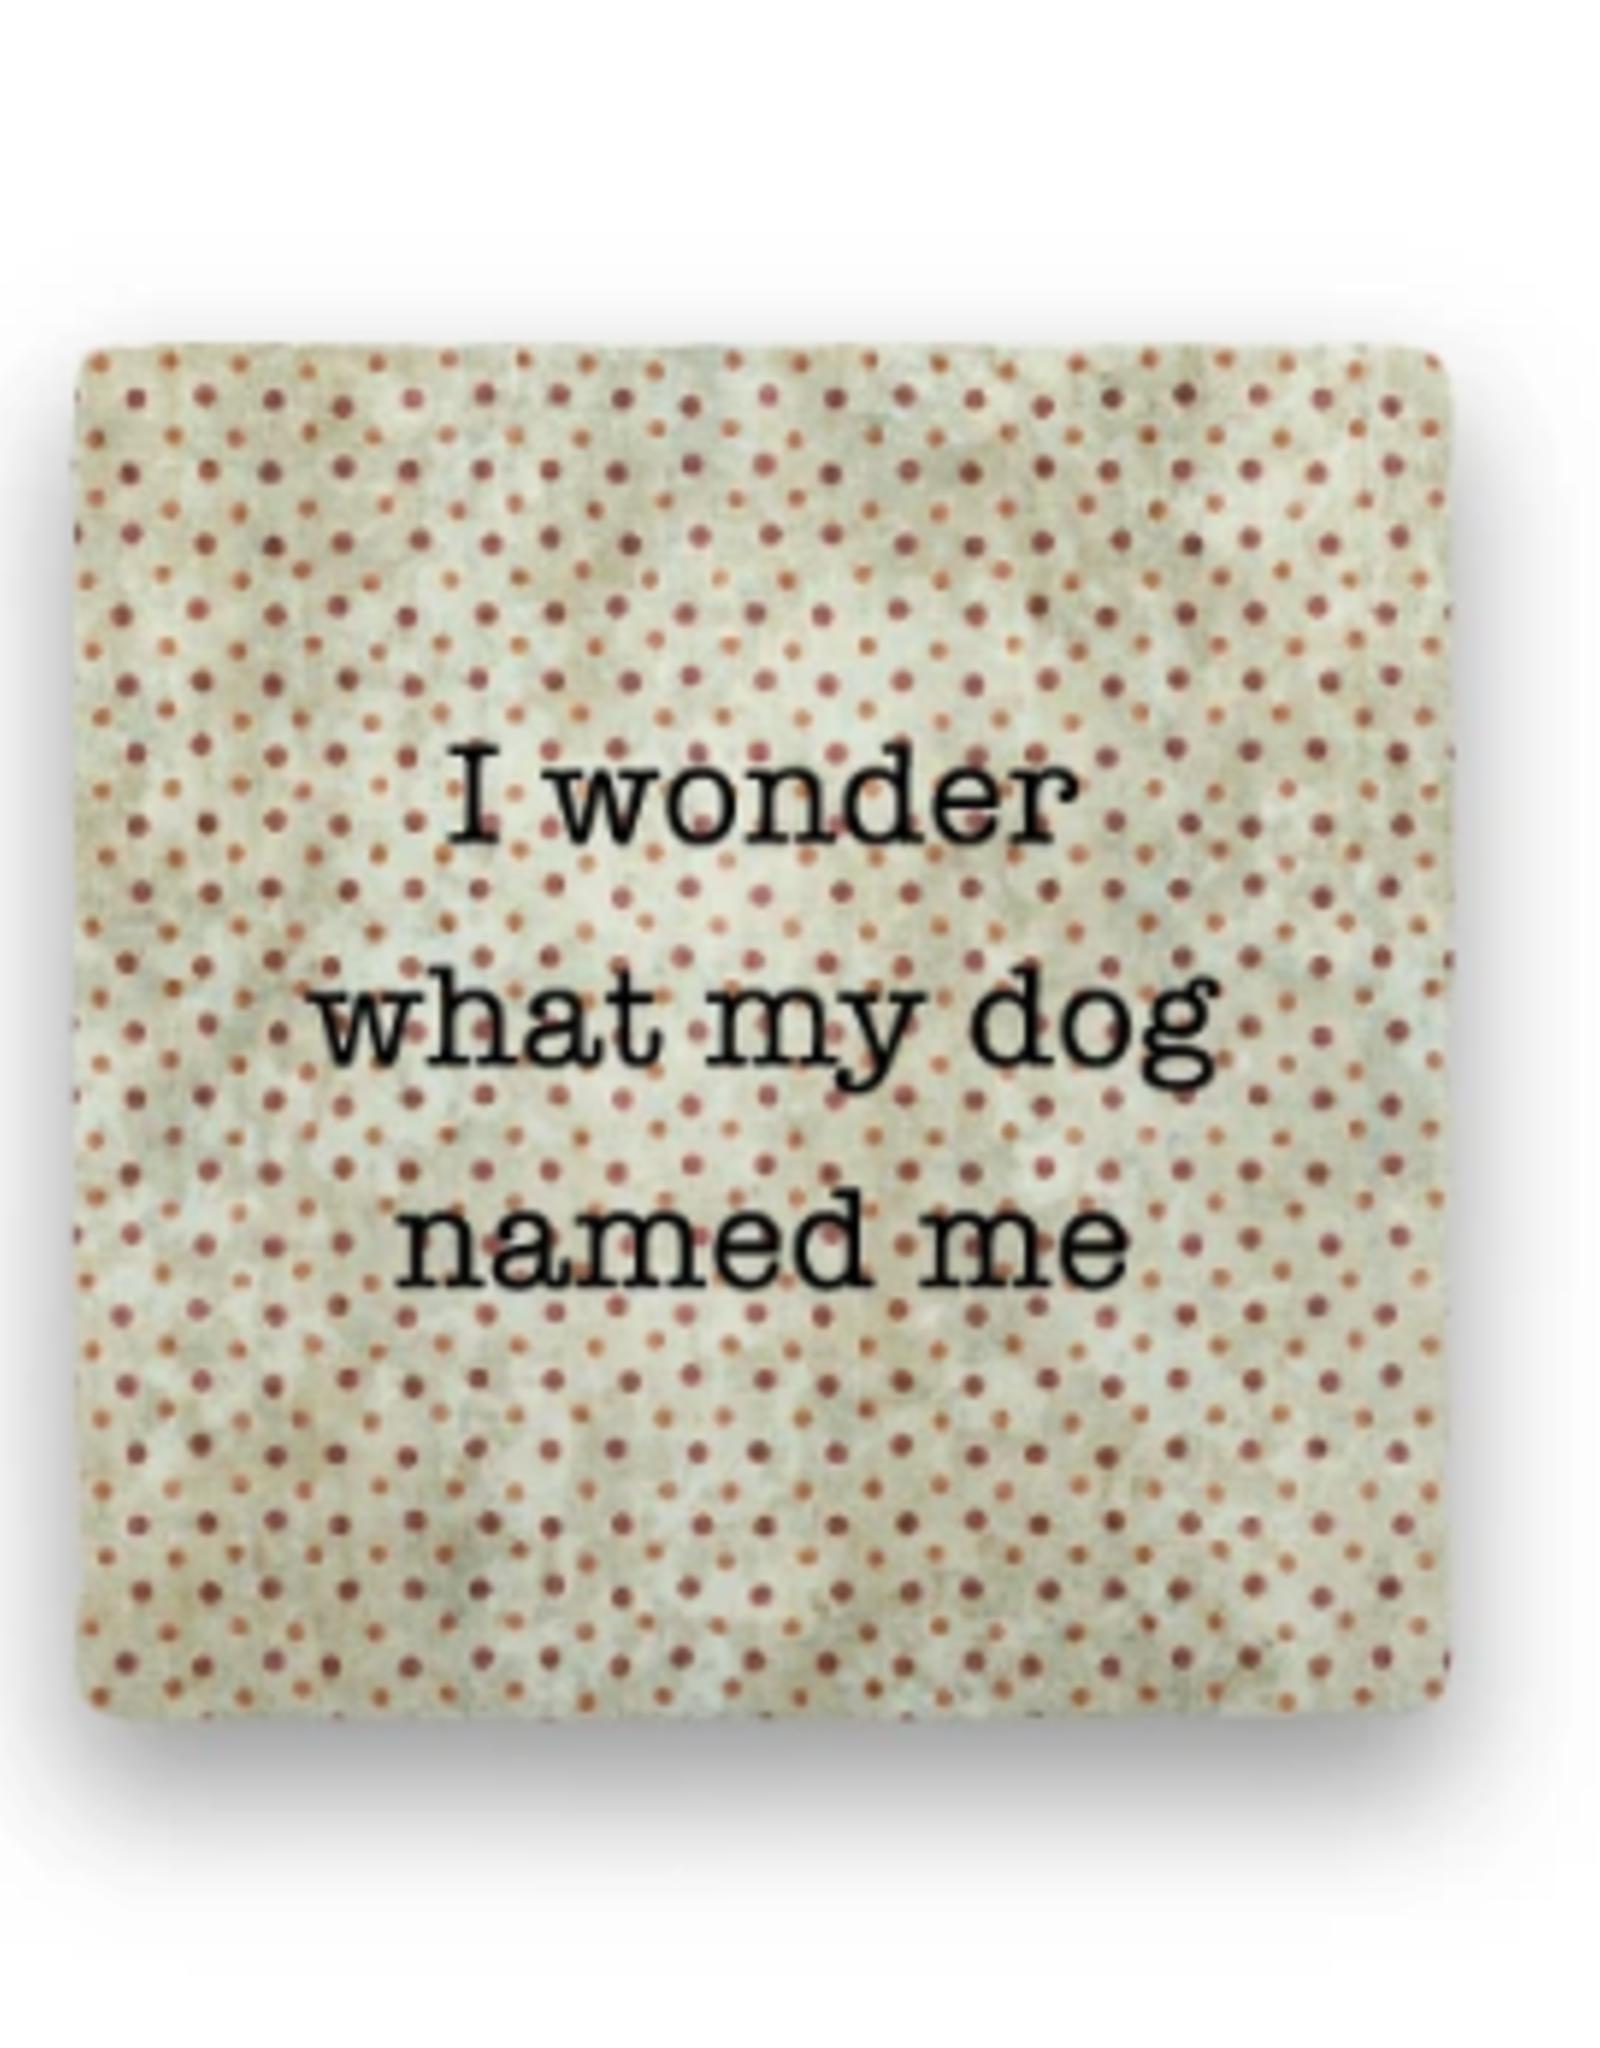 Paisley & Parsley Designs Coaster, Dog Named Me